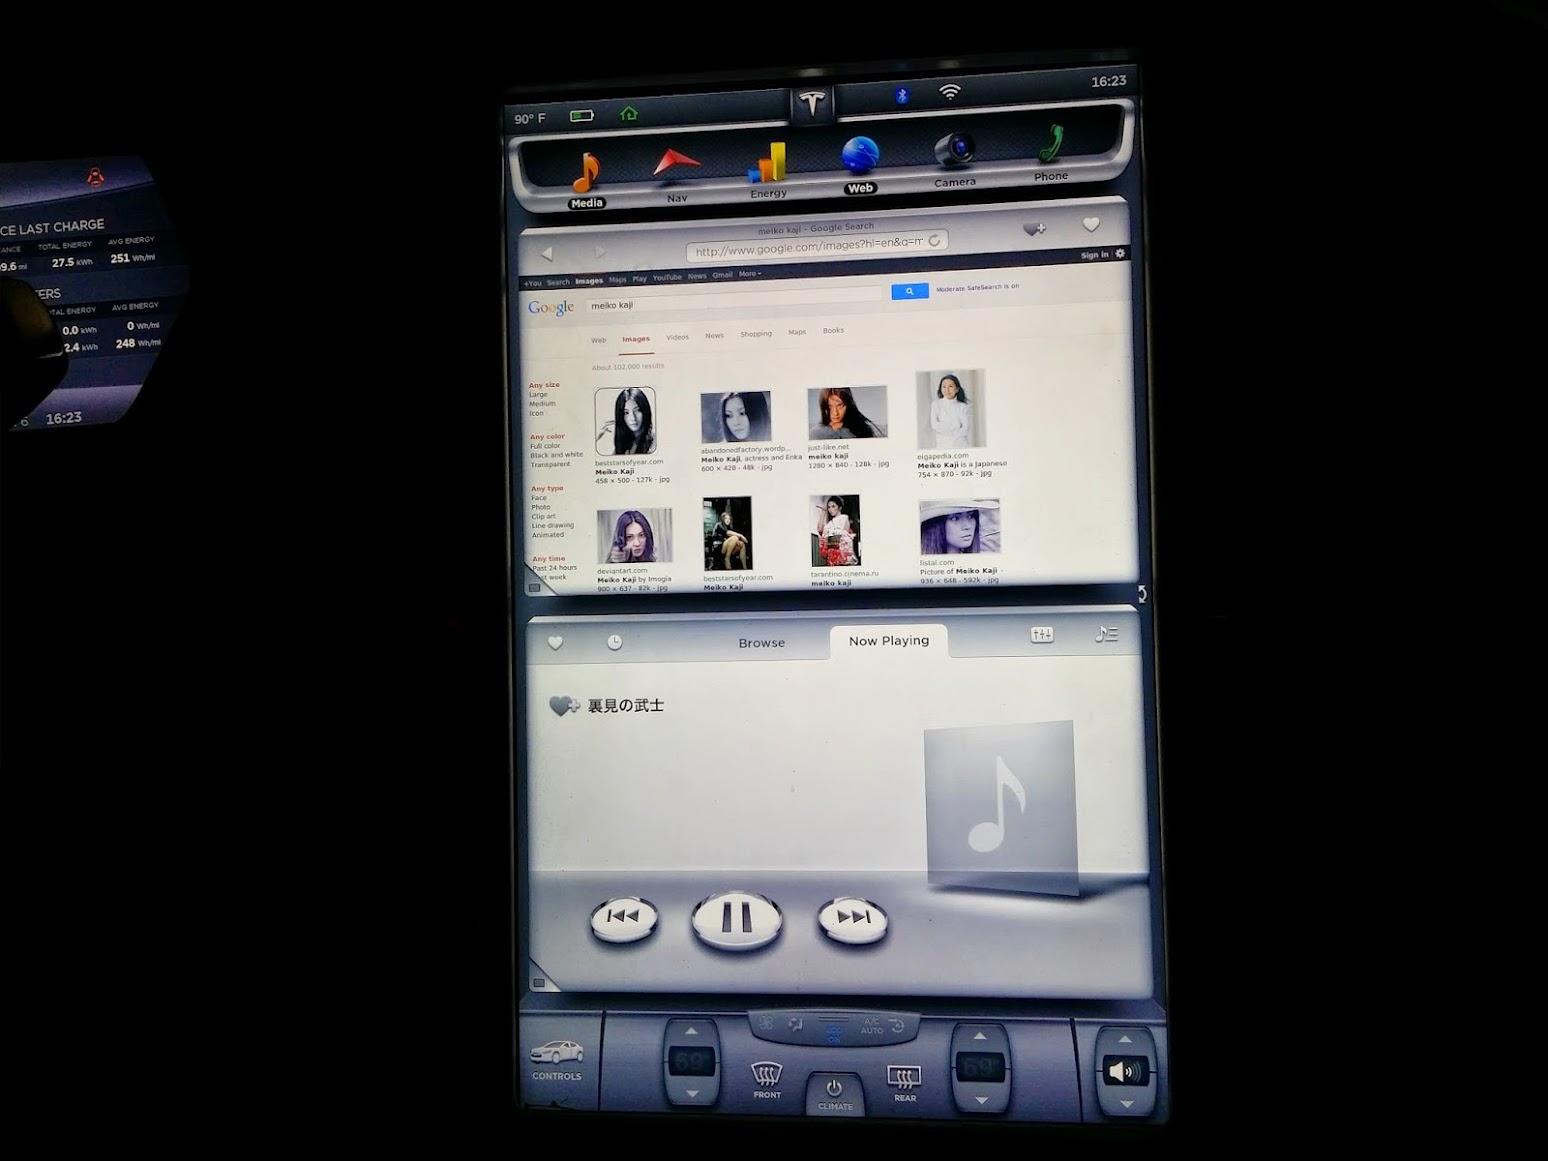 USB Drive FAT32 Music Format Question | Tesla Motors